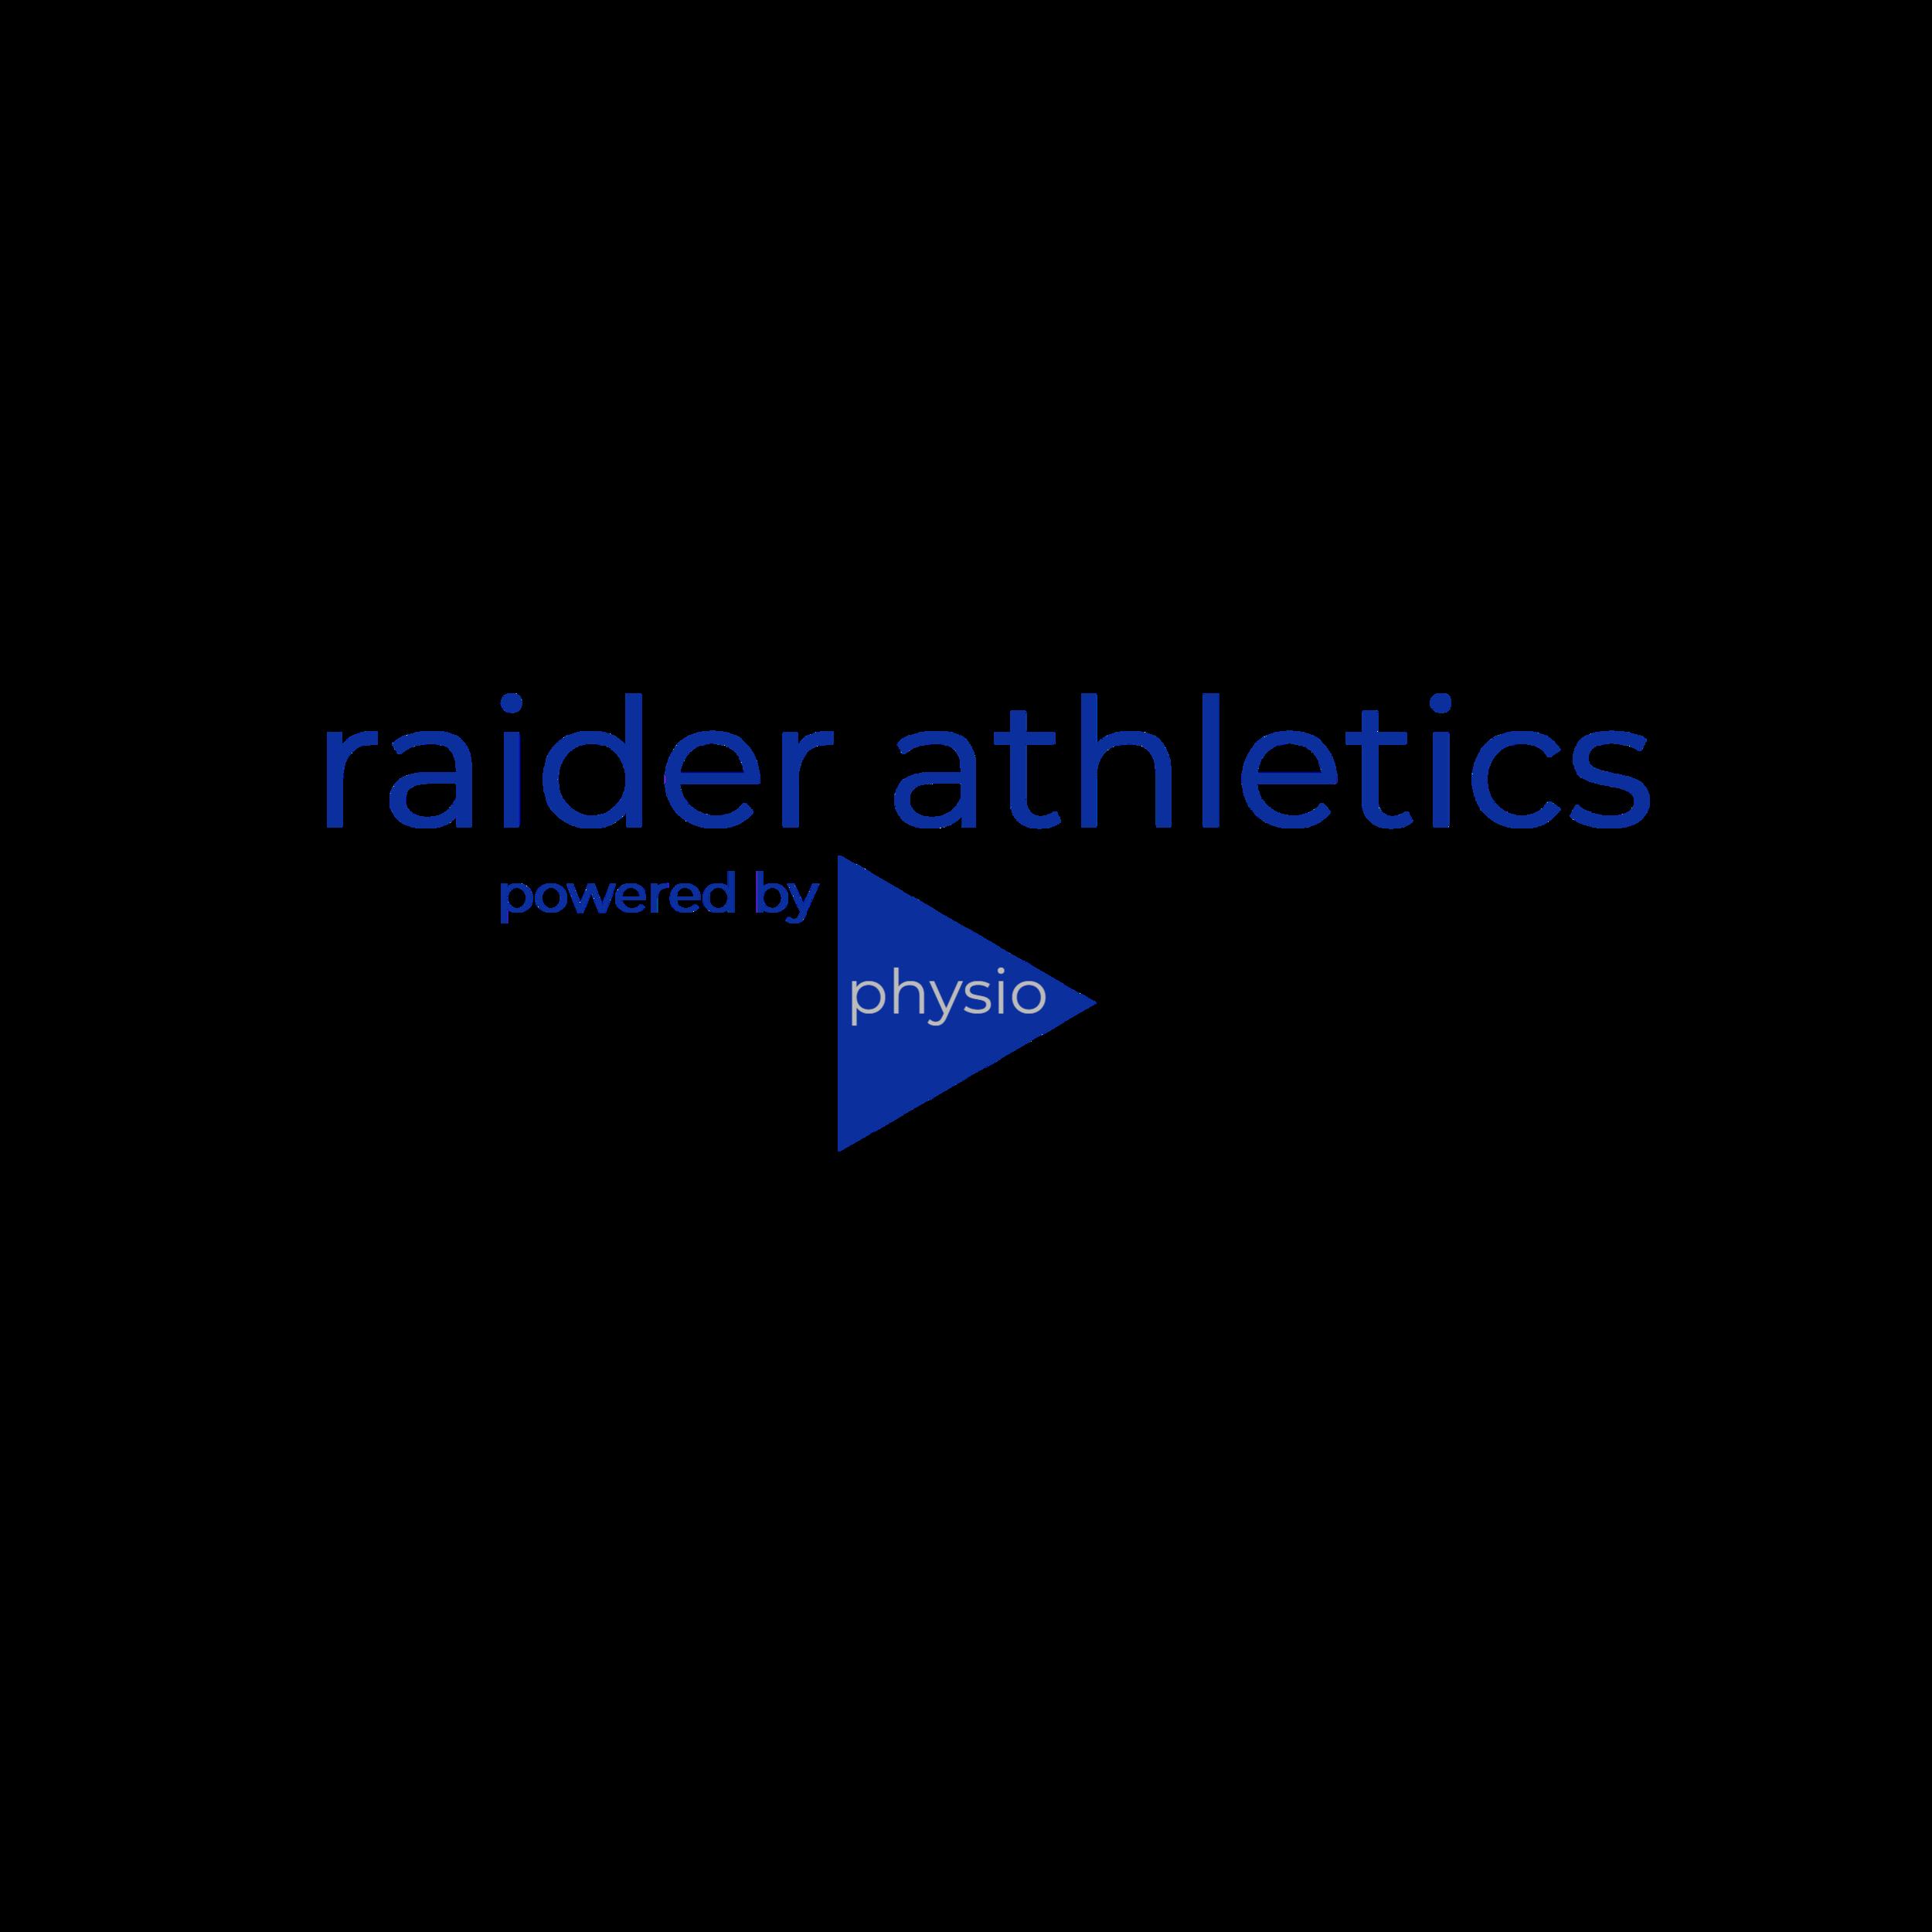 raider athletics1.png